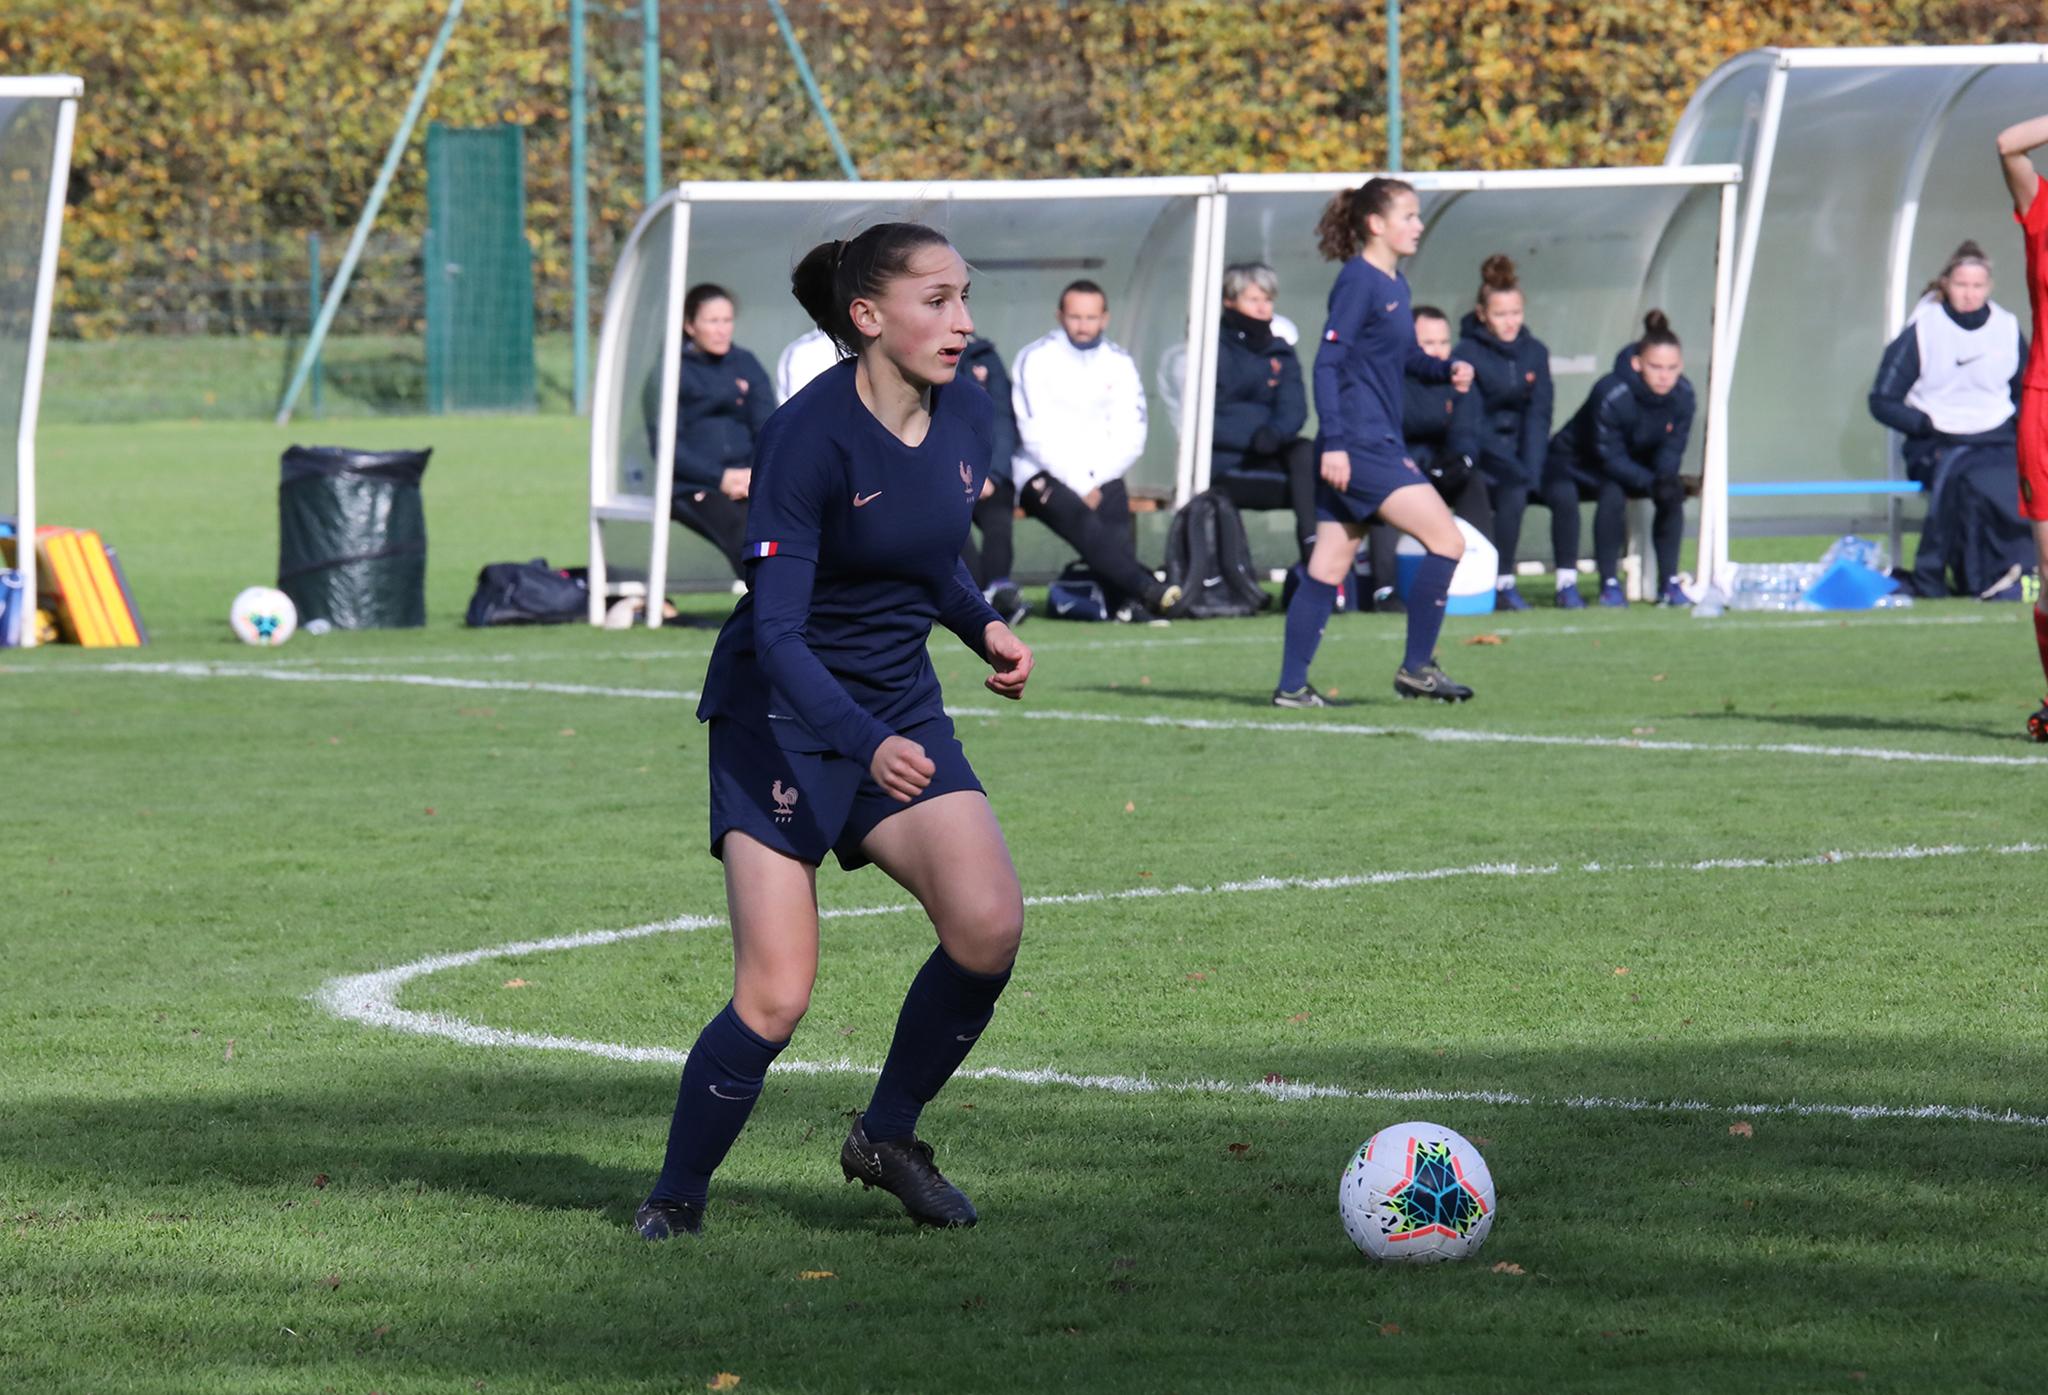 Sélection U19 Féminine